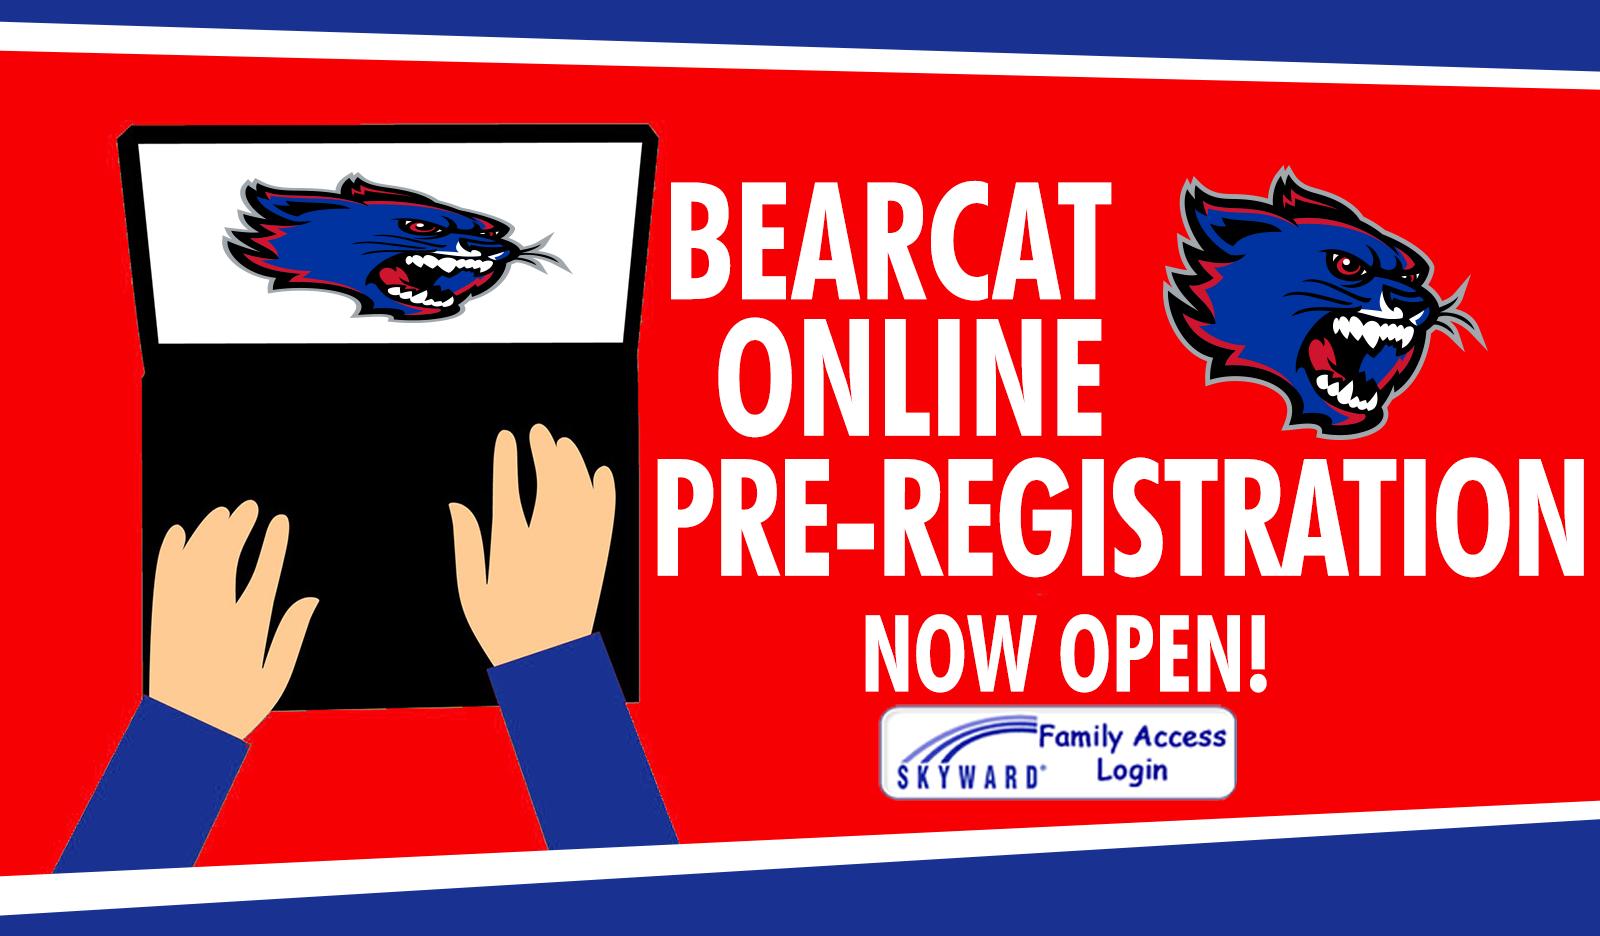 Online Pre-Registration